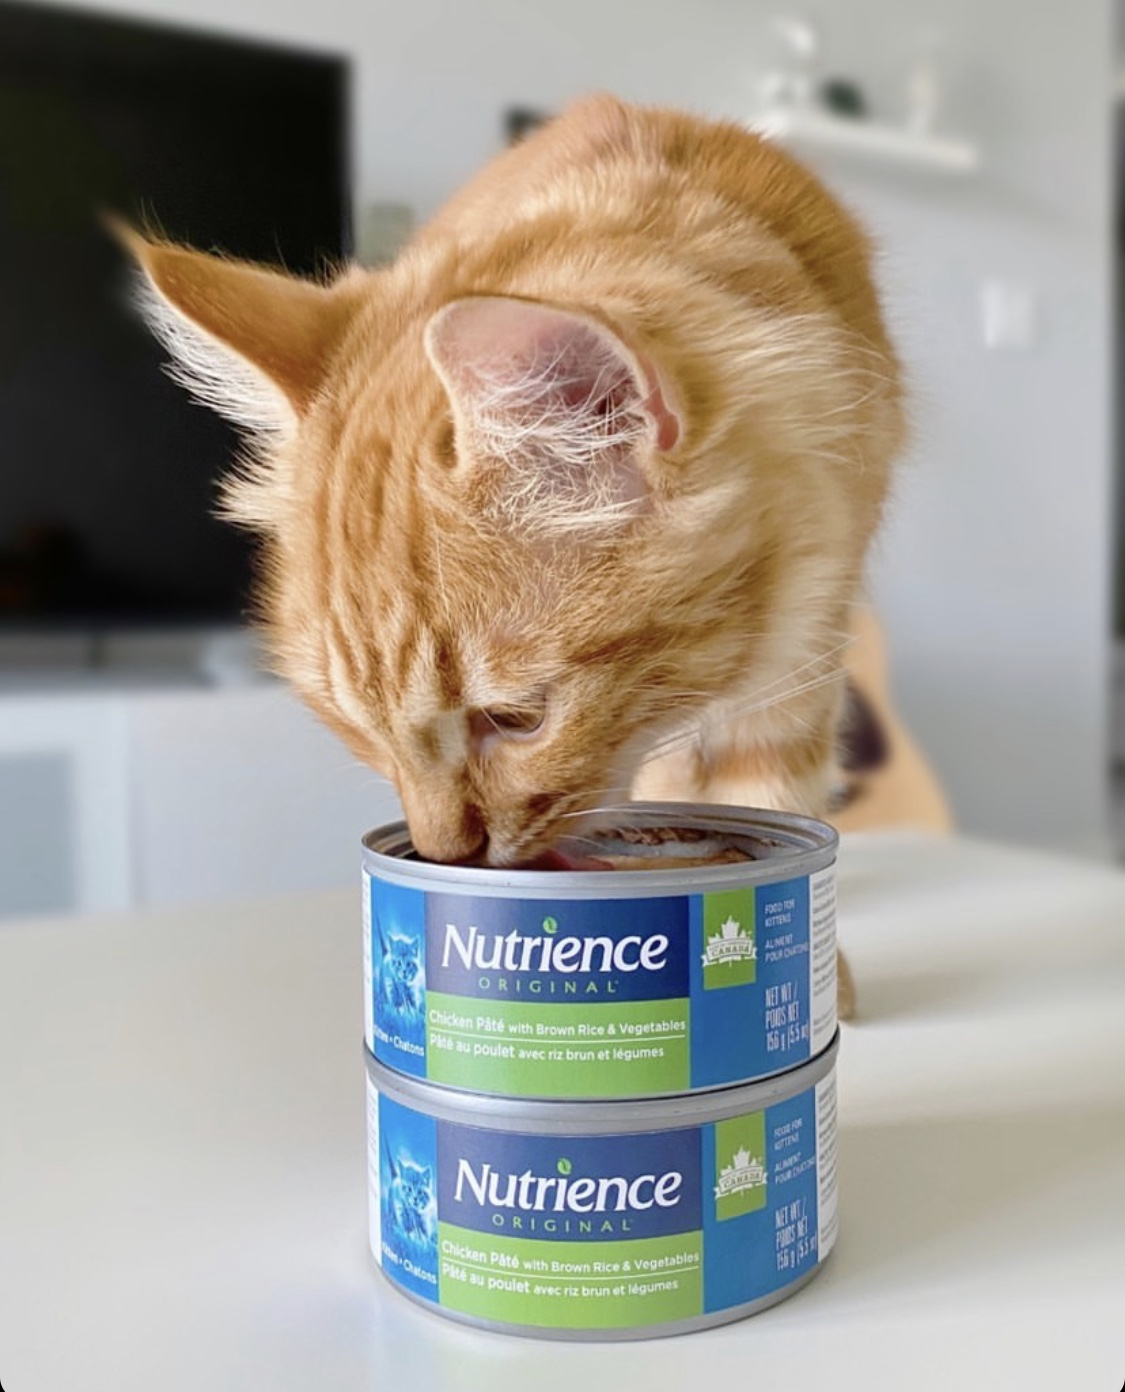 cat with Nutrience Original